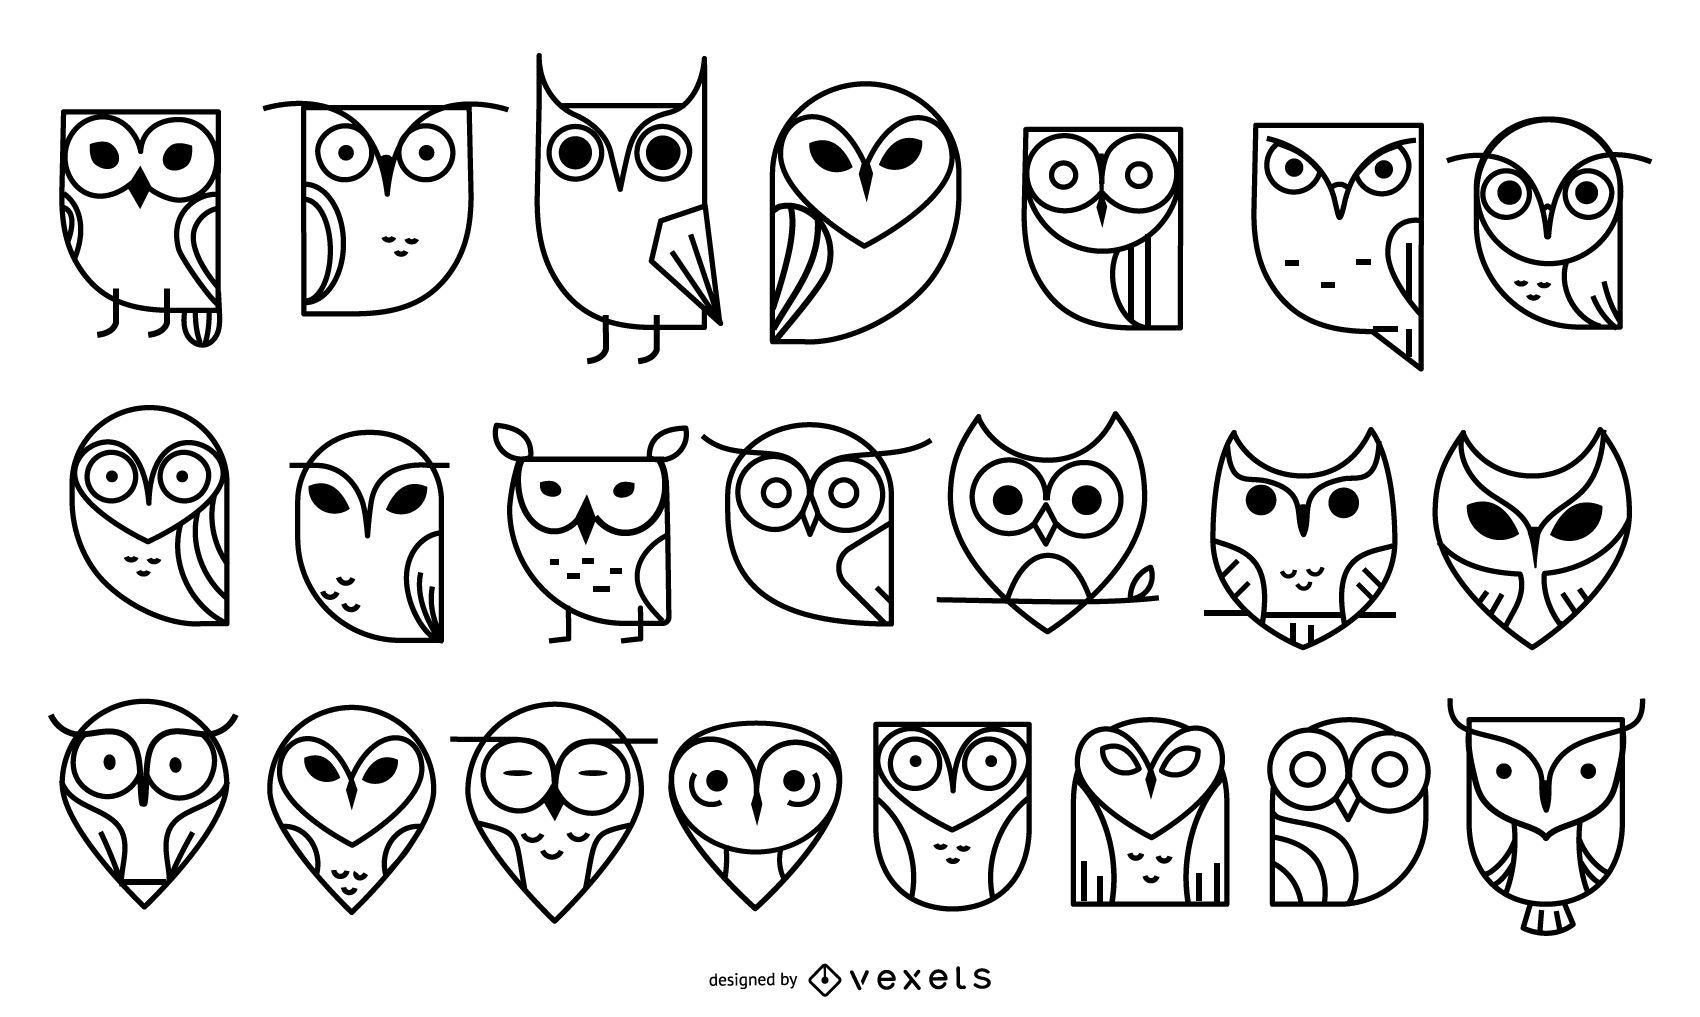 Owl stroke icon collection